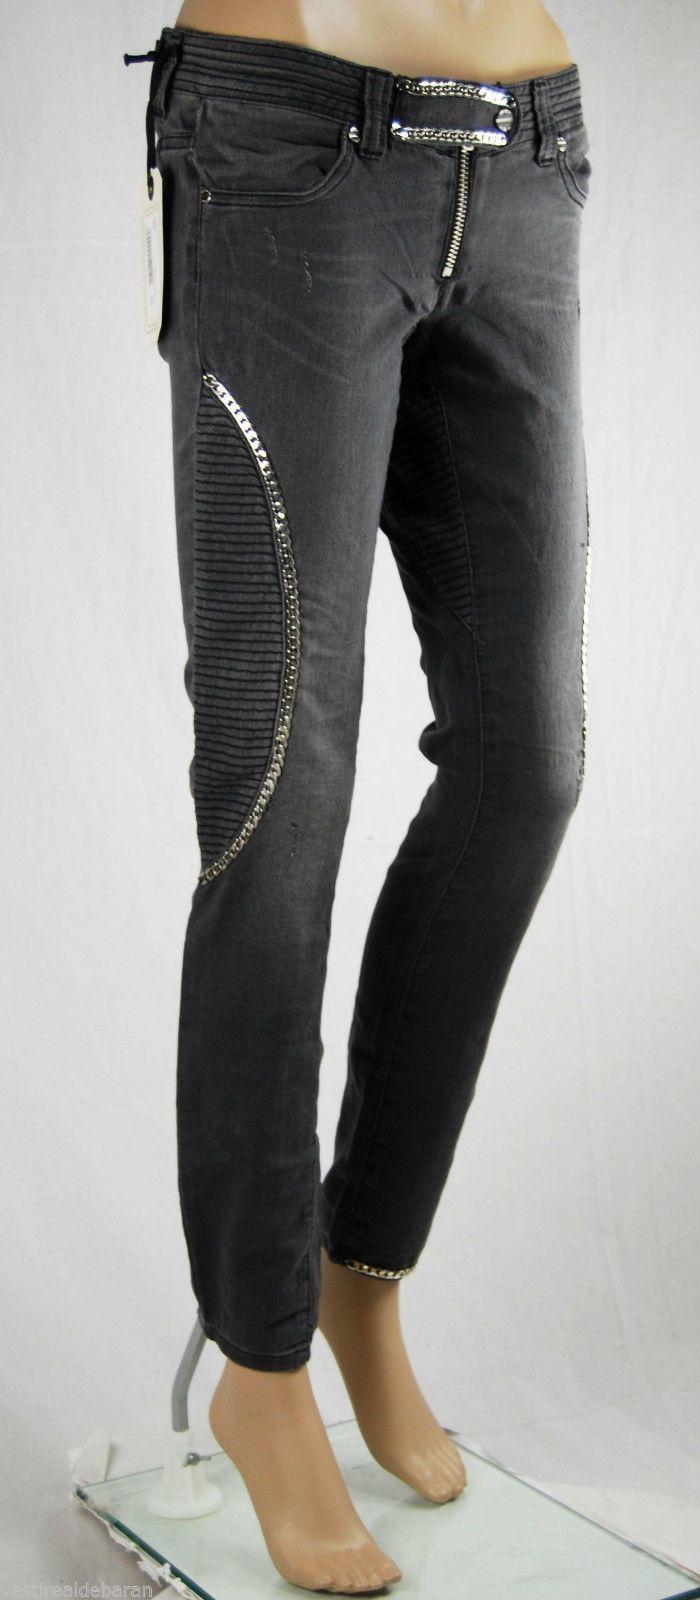 Jeans MET http://stores.ebay.it/VESTIRE-ALDEBARAN